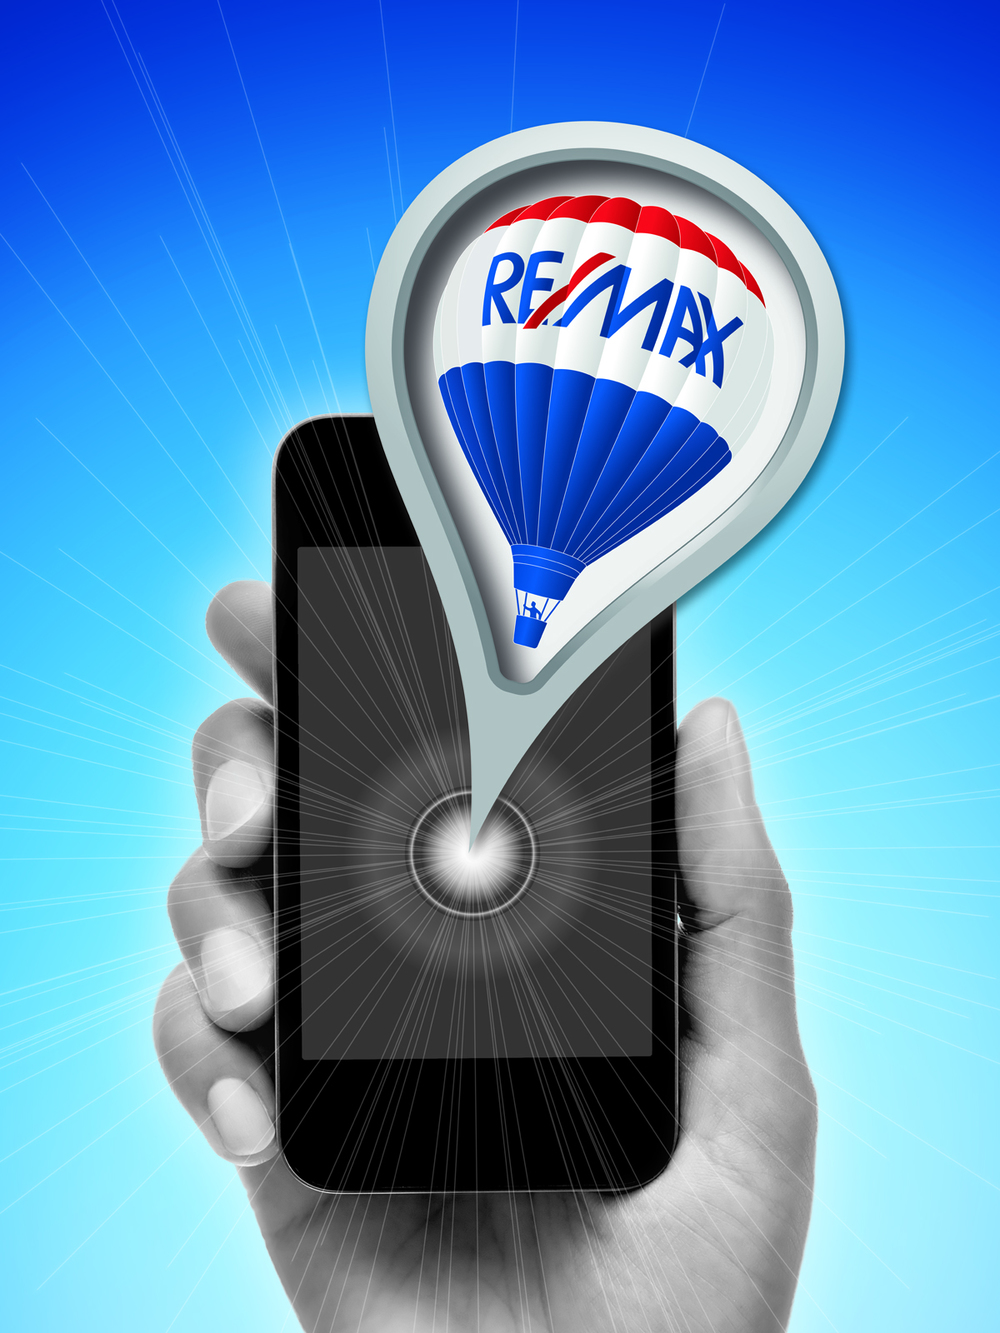 id logos-remax2.jpg